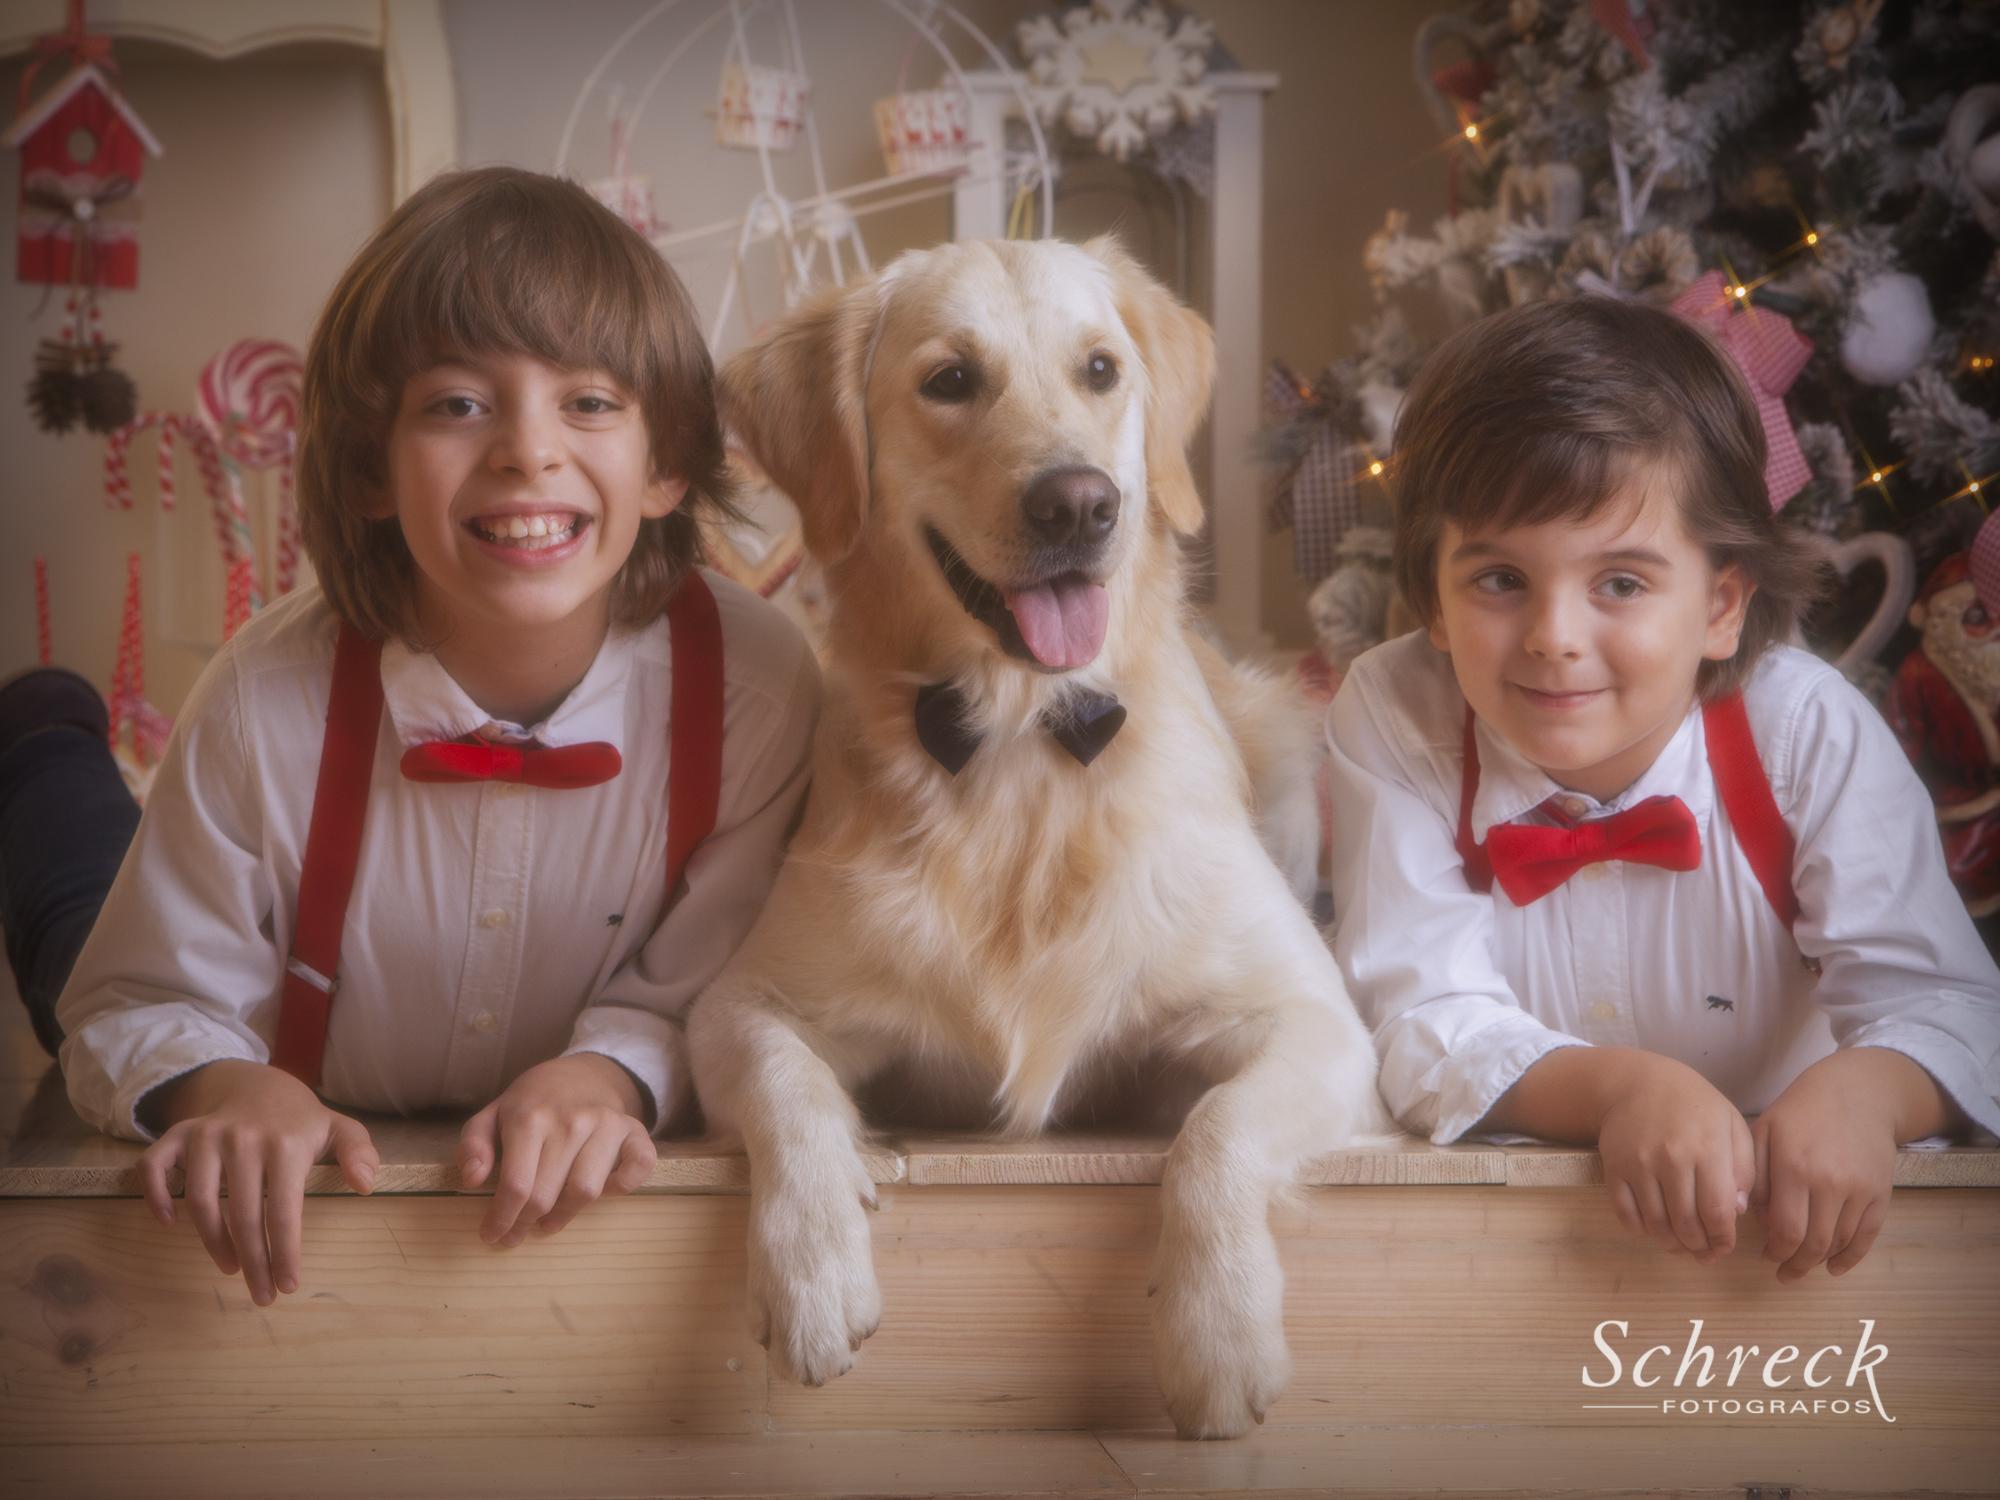 Schreck-Christmas_25